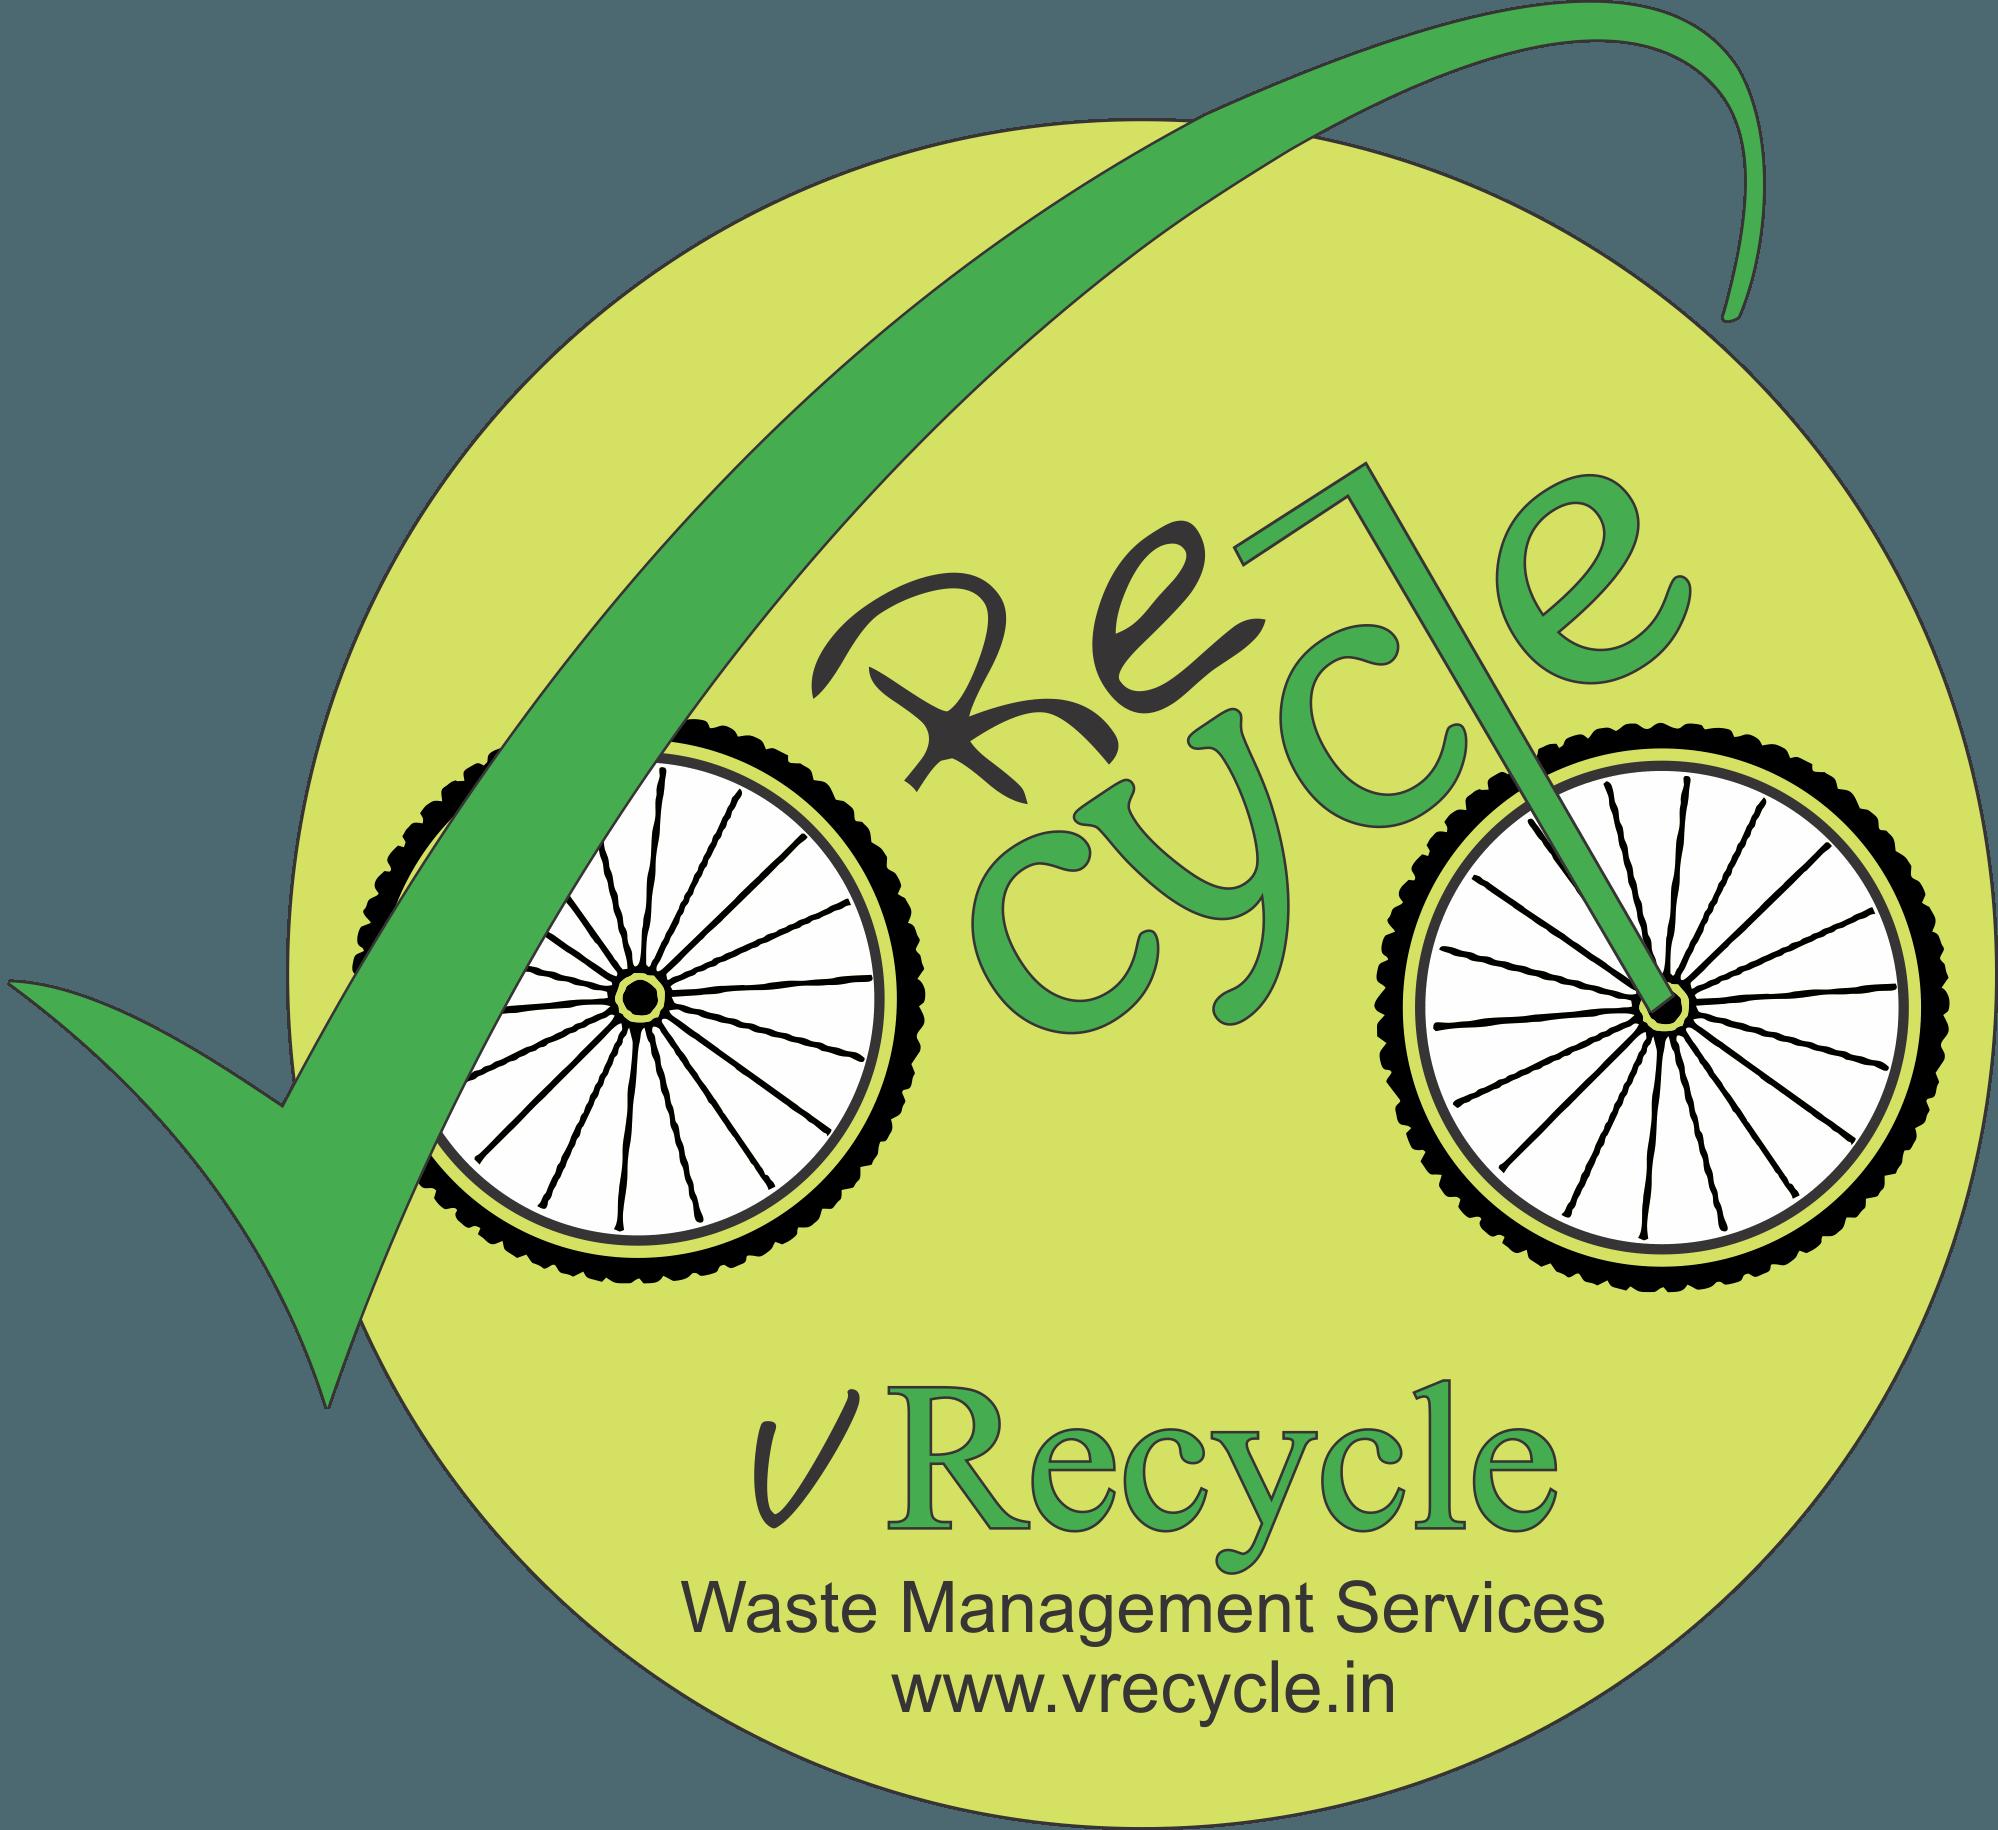 vRecycle Logo v4.0-min